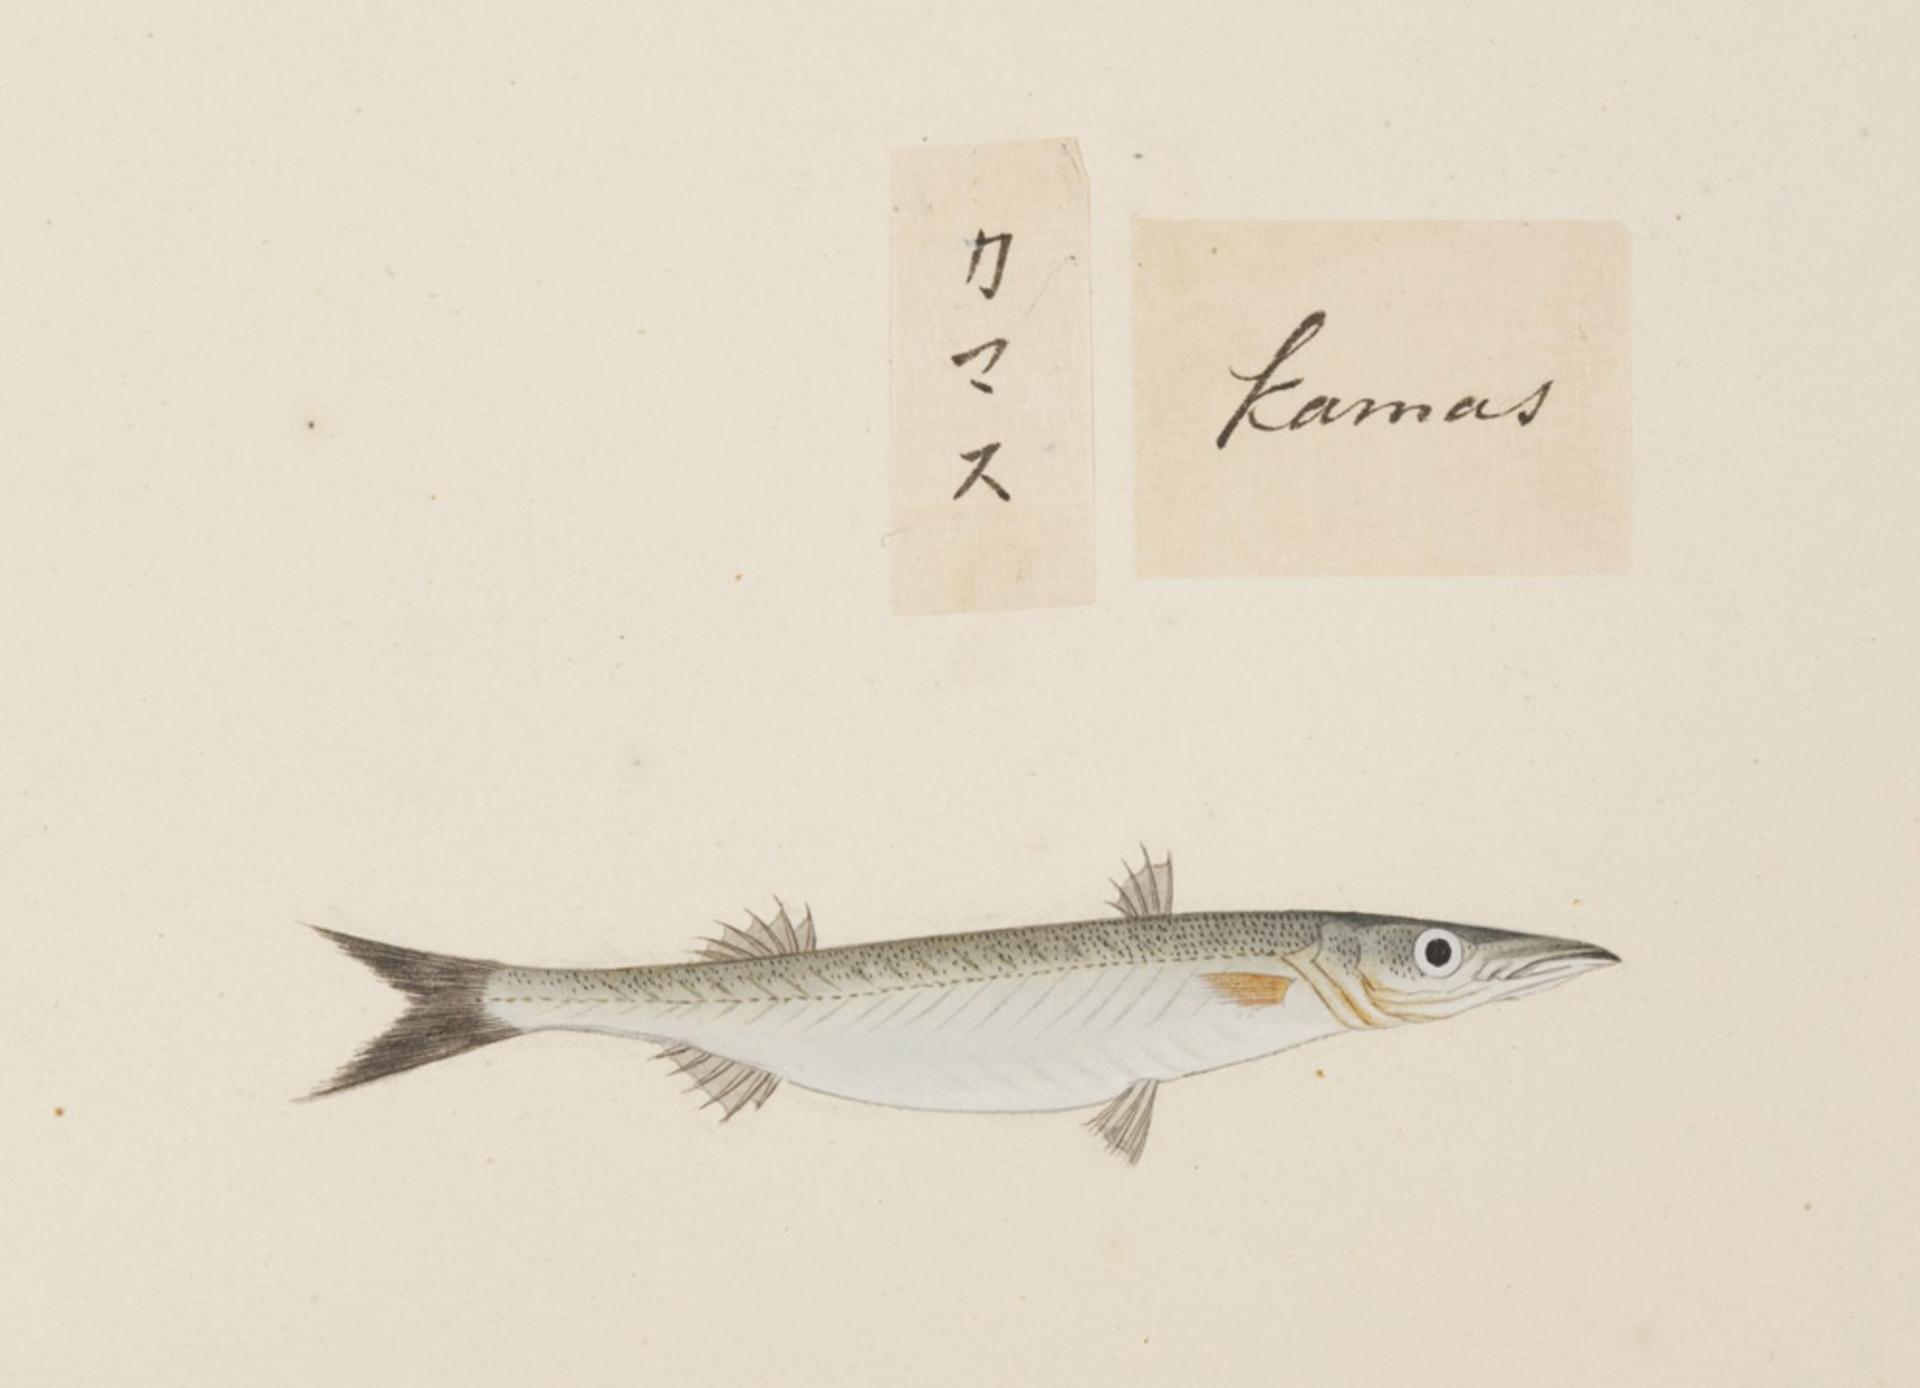 RMNH.ART.541 | Sphyracena sp